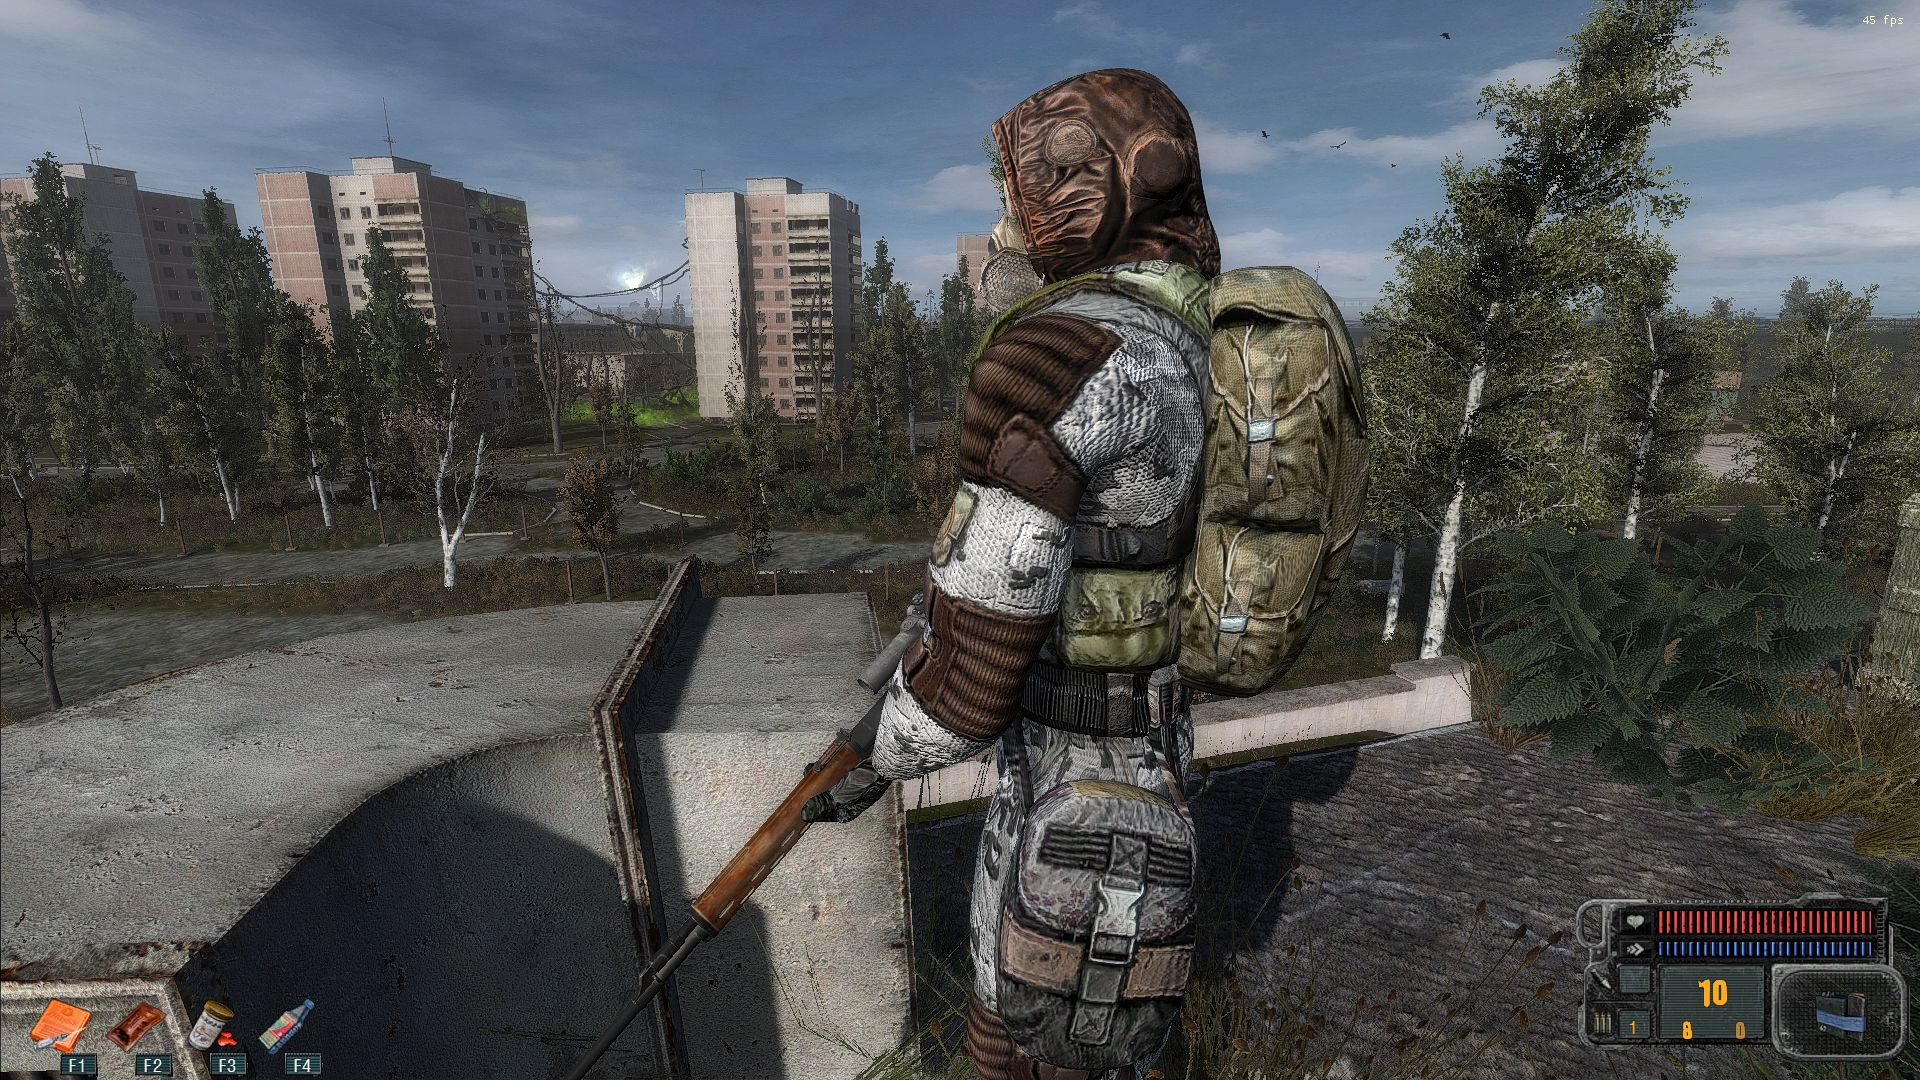 000371.Jpg - S.T.A.L.K.E.R.: Call of Pripyat